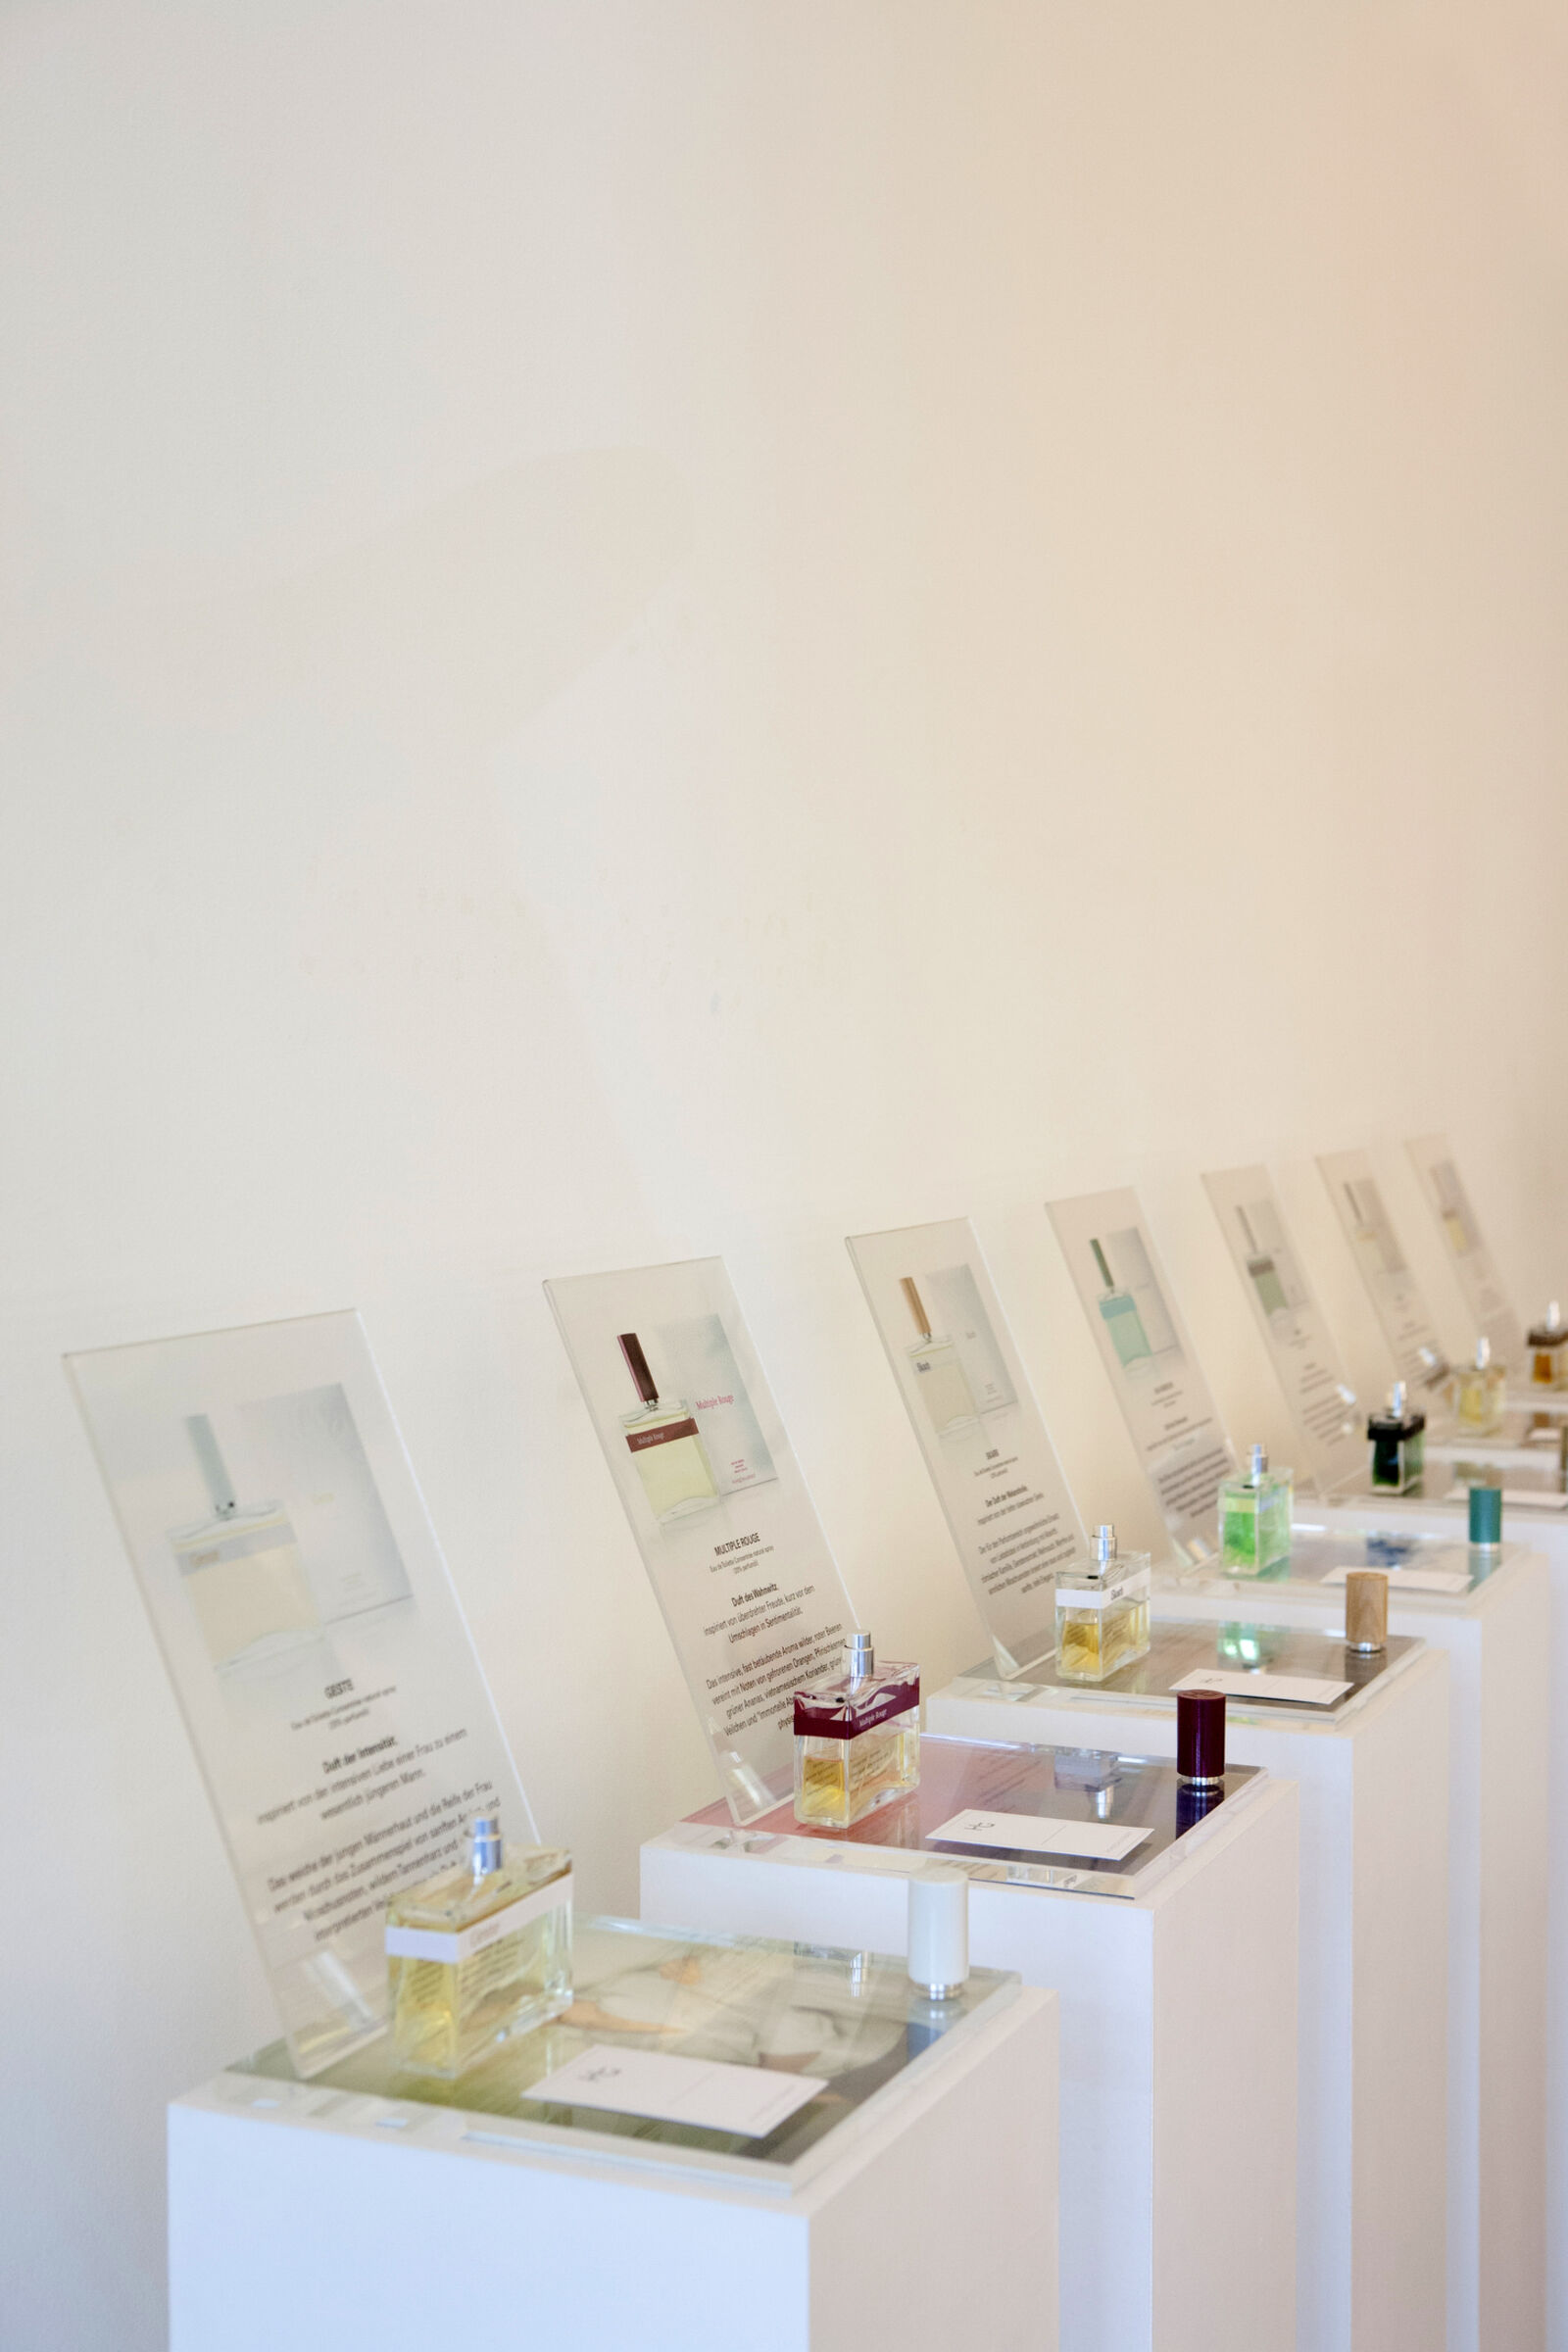 BREATHE fresh cosmetics in Berlin (Bild 6)